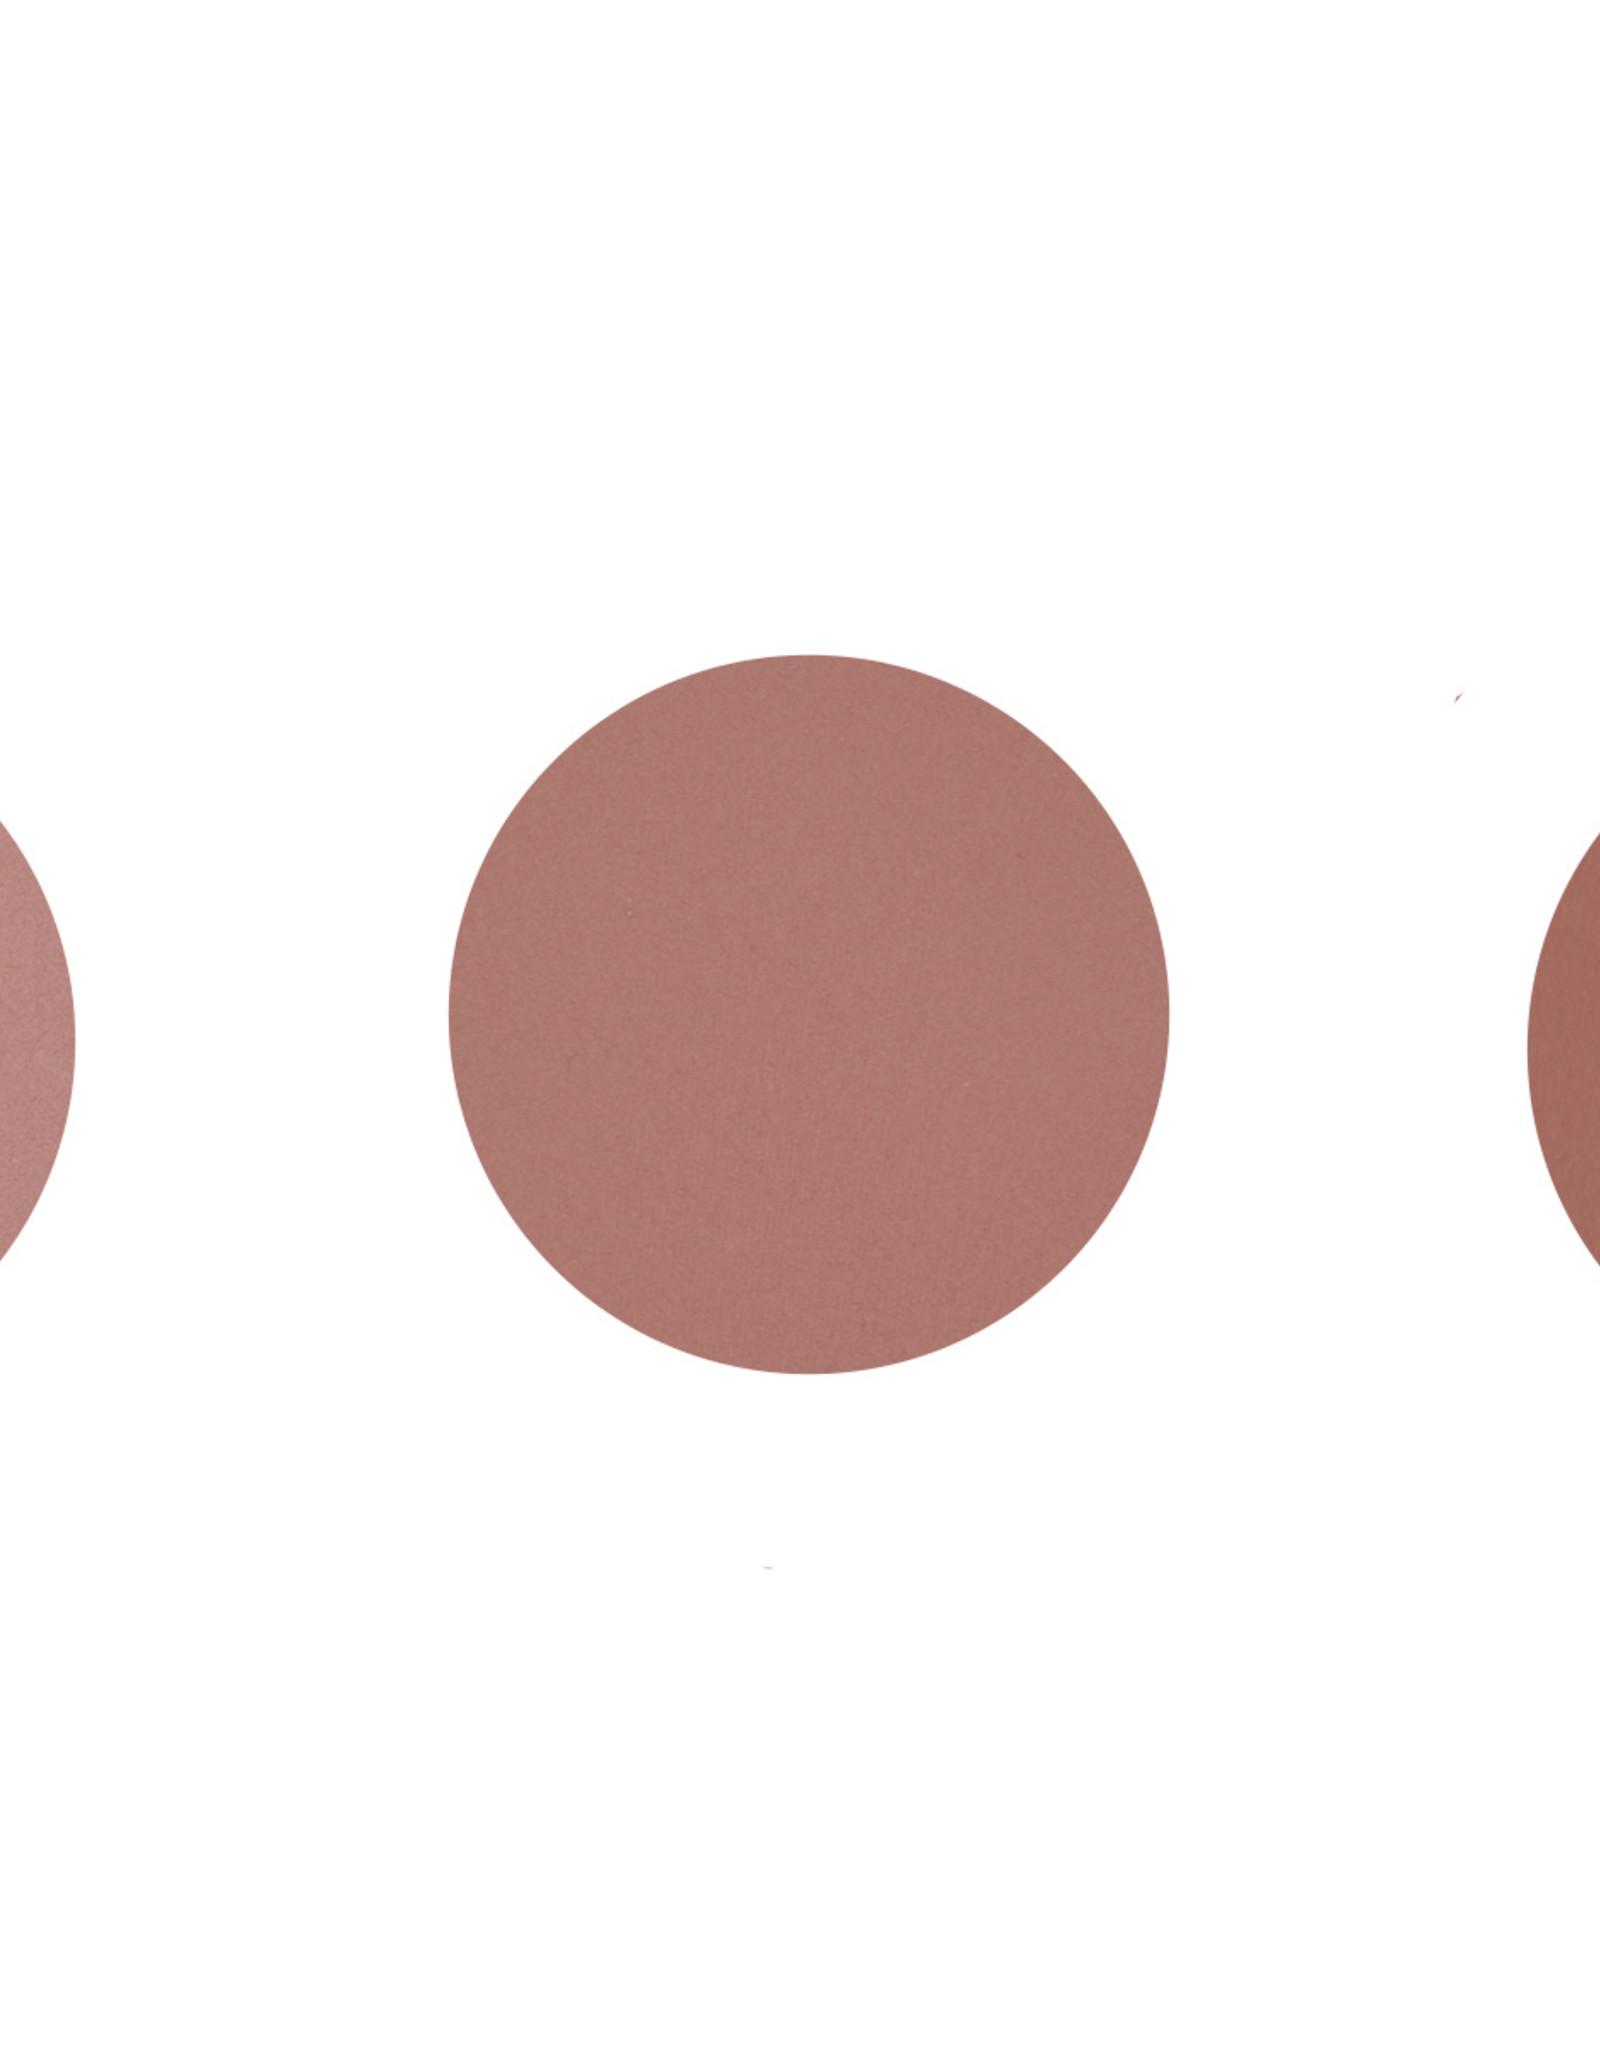 CentpurCent Cent pur Cent - Refillable Compacte Foundation - Medium